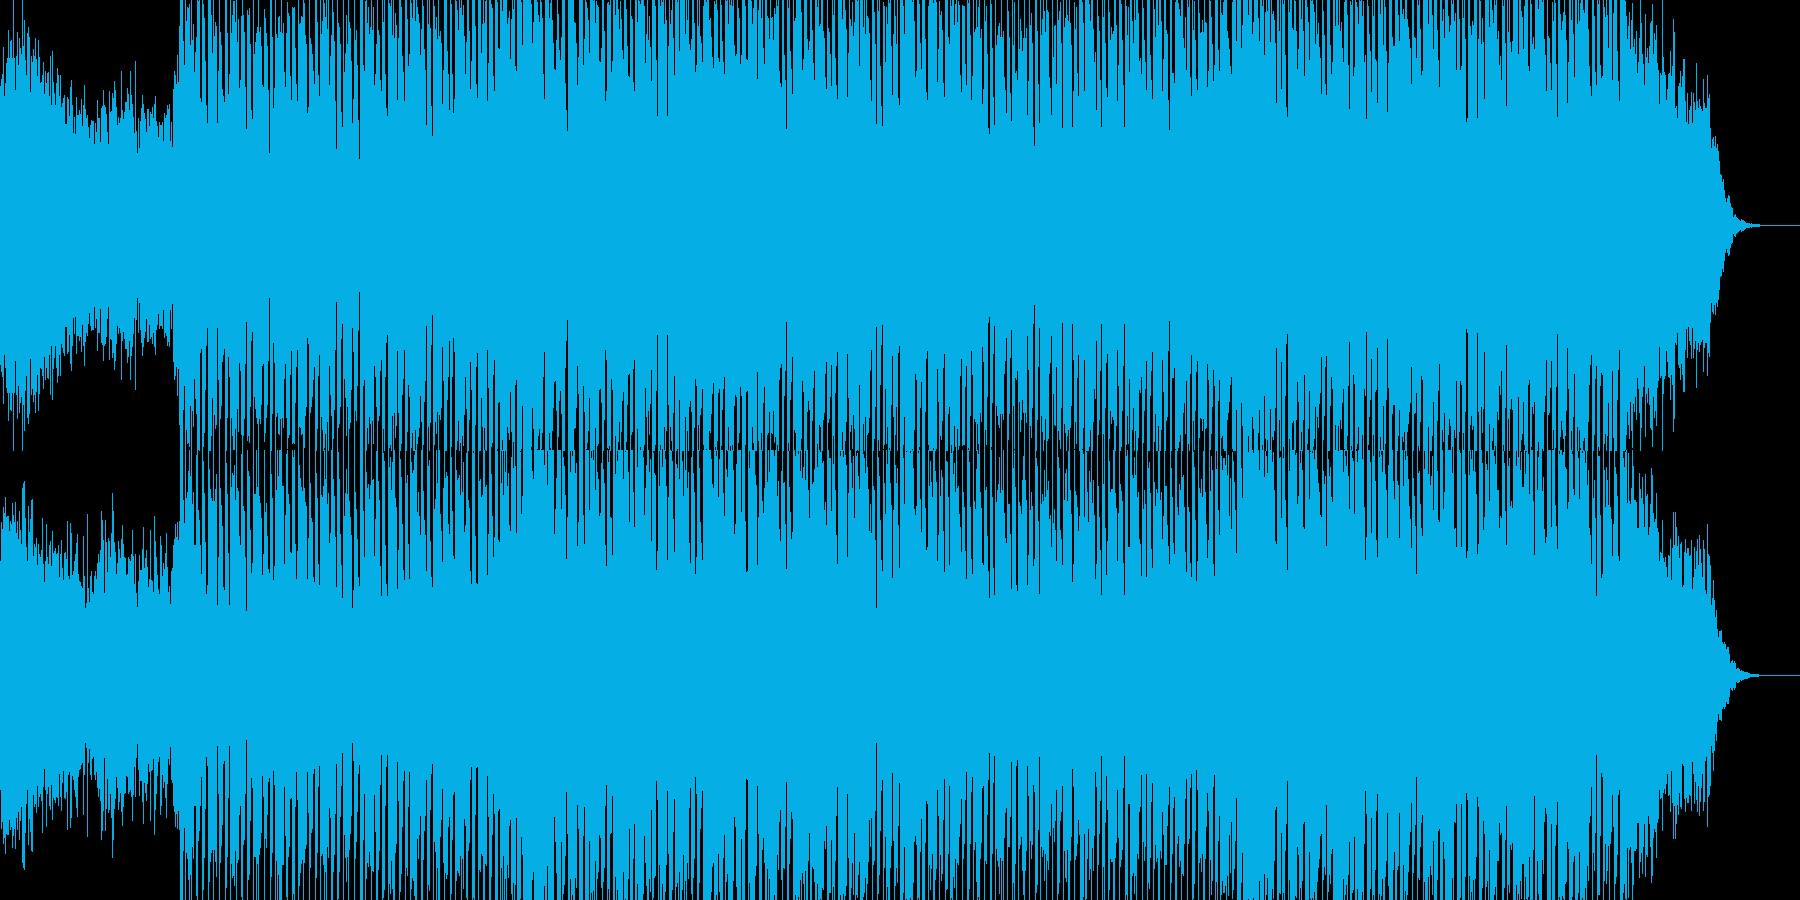 EDMクラブ系ダンスミュージック-83の再生済みの波形